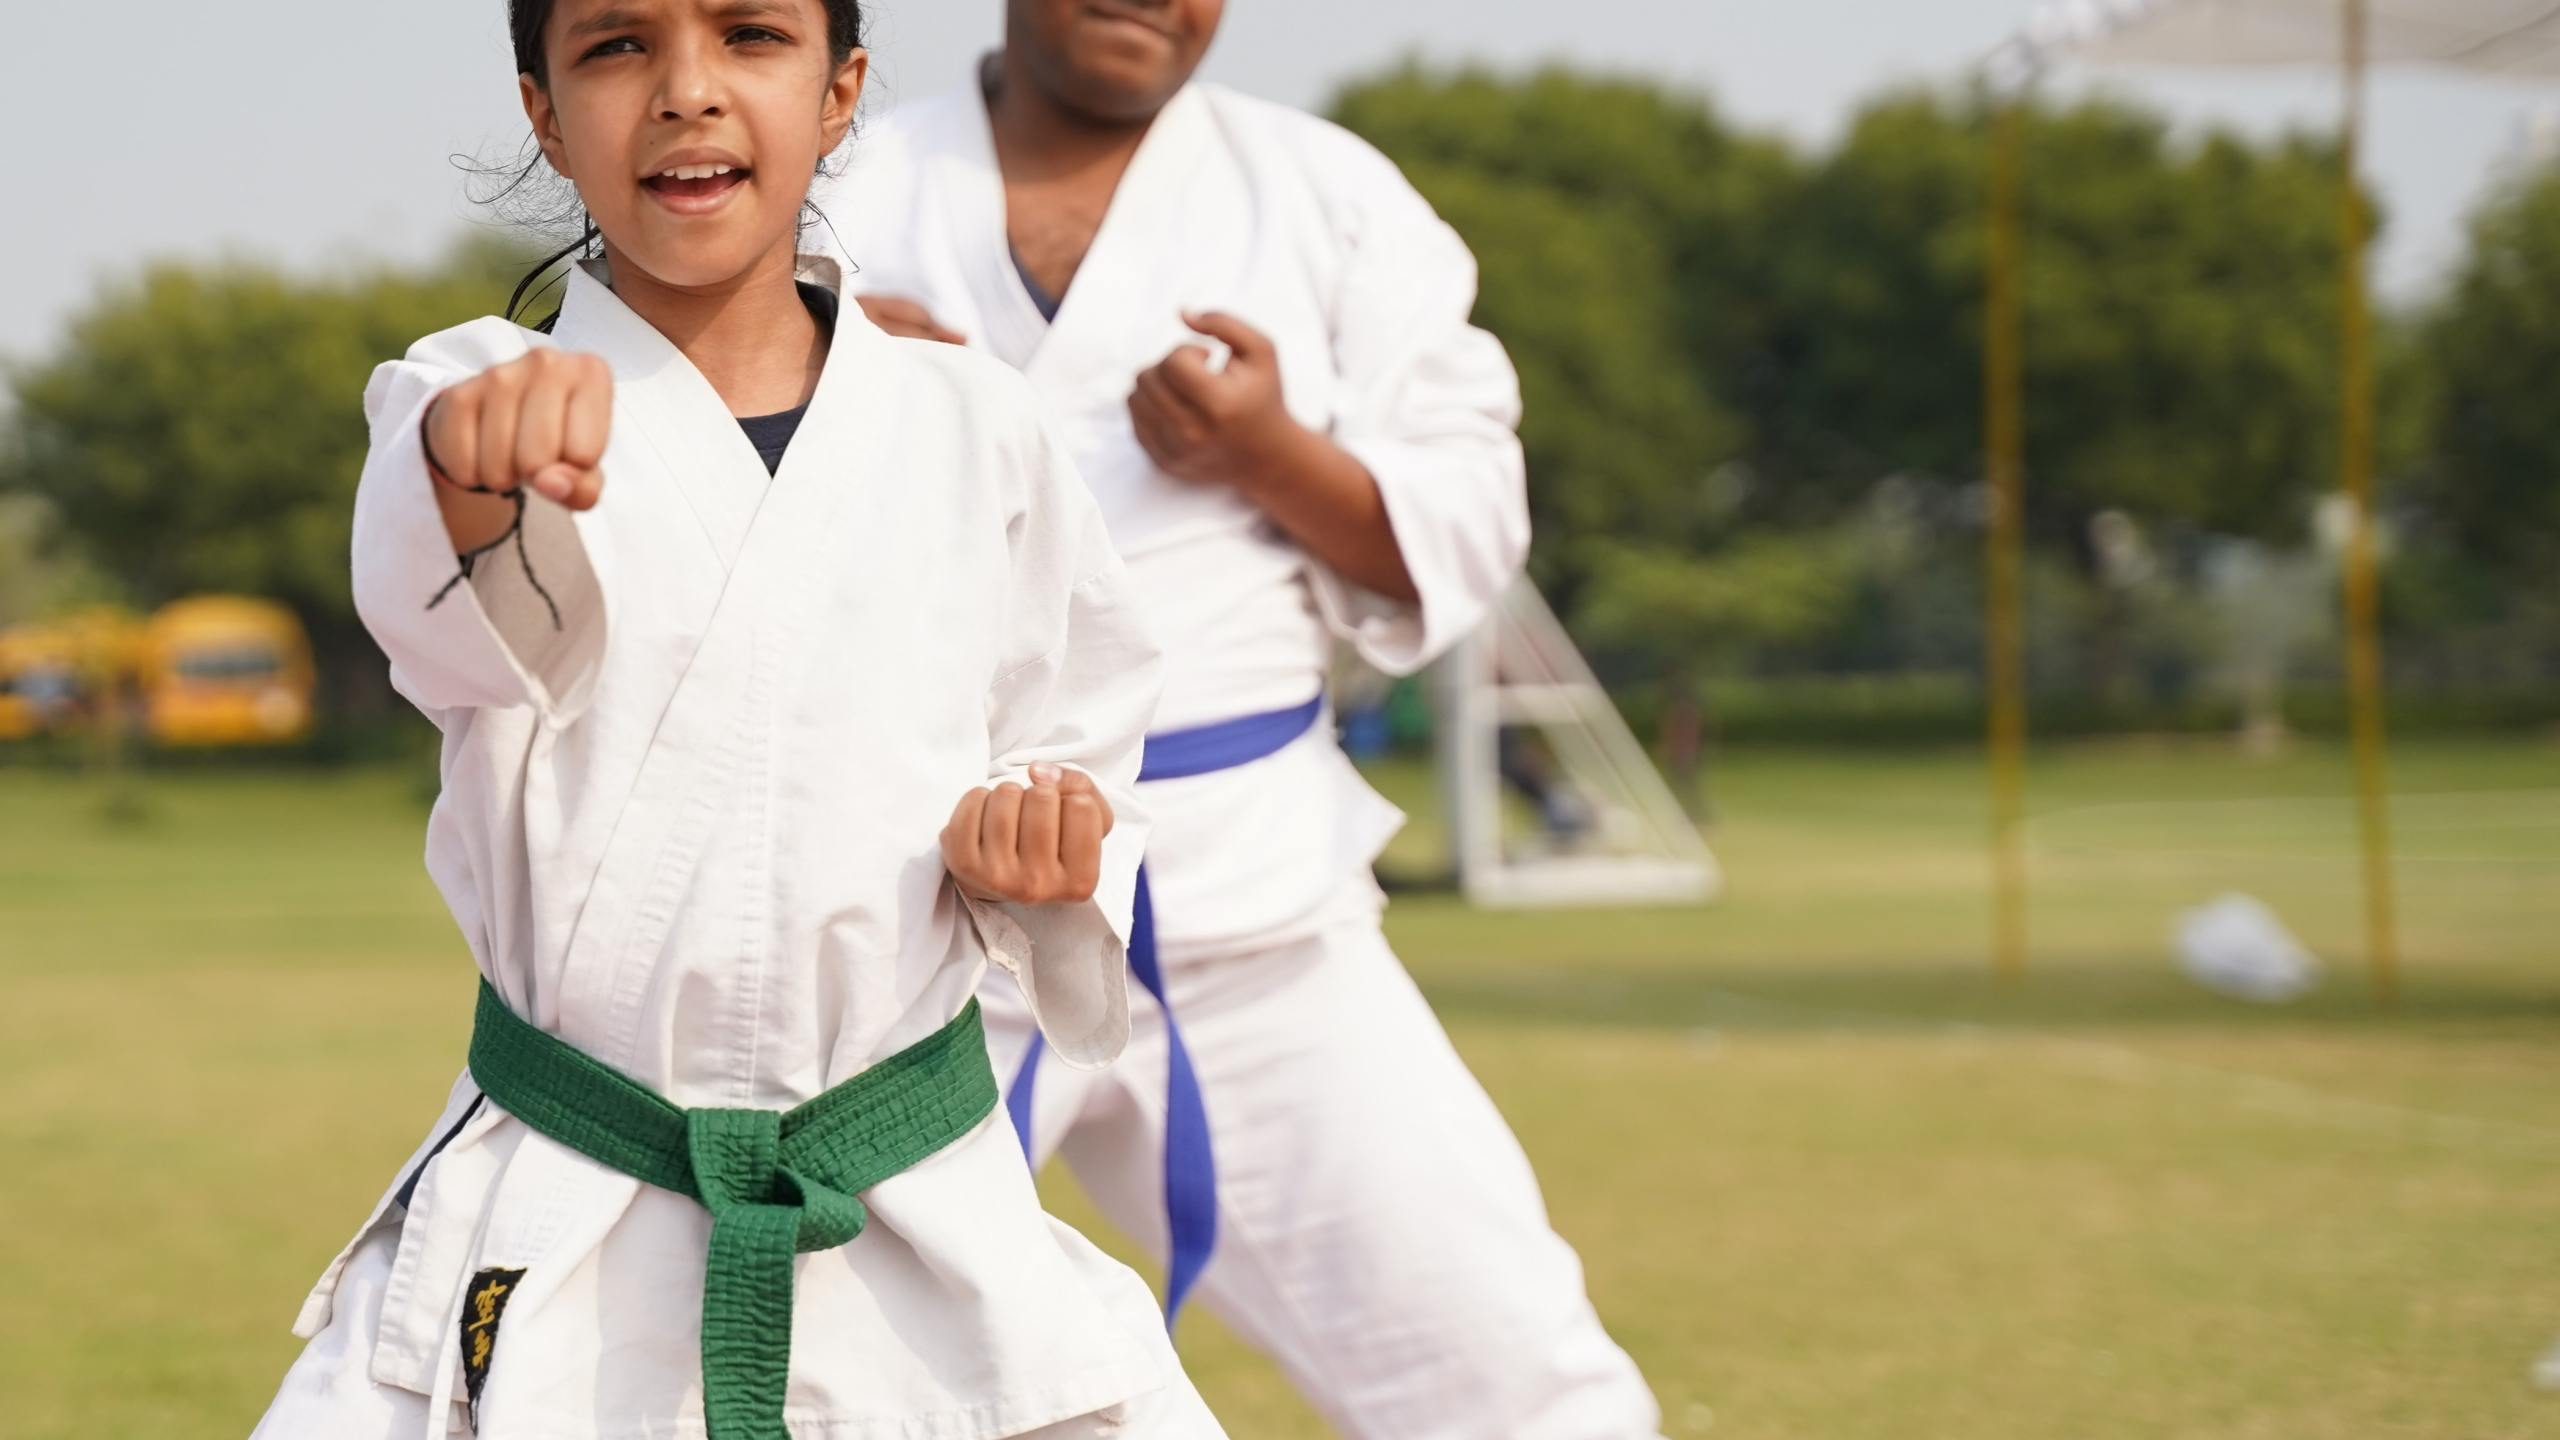 A child receiving karate training. (Ashima Pargal / Unsplash)